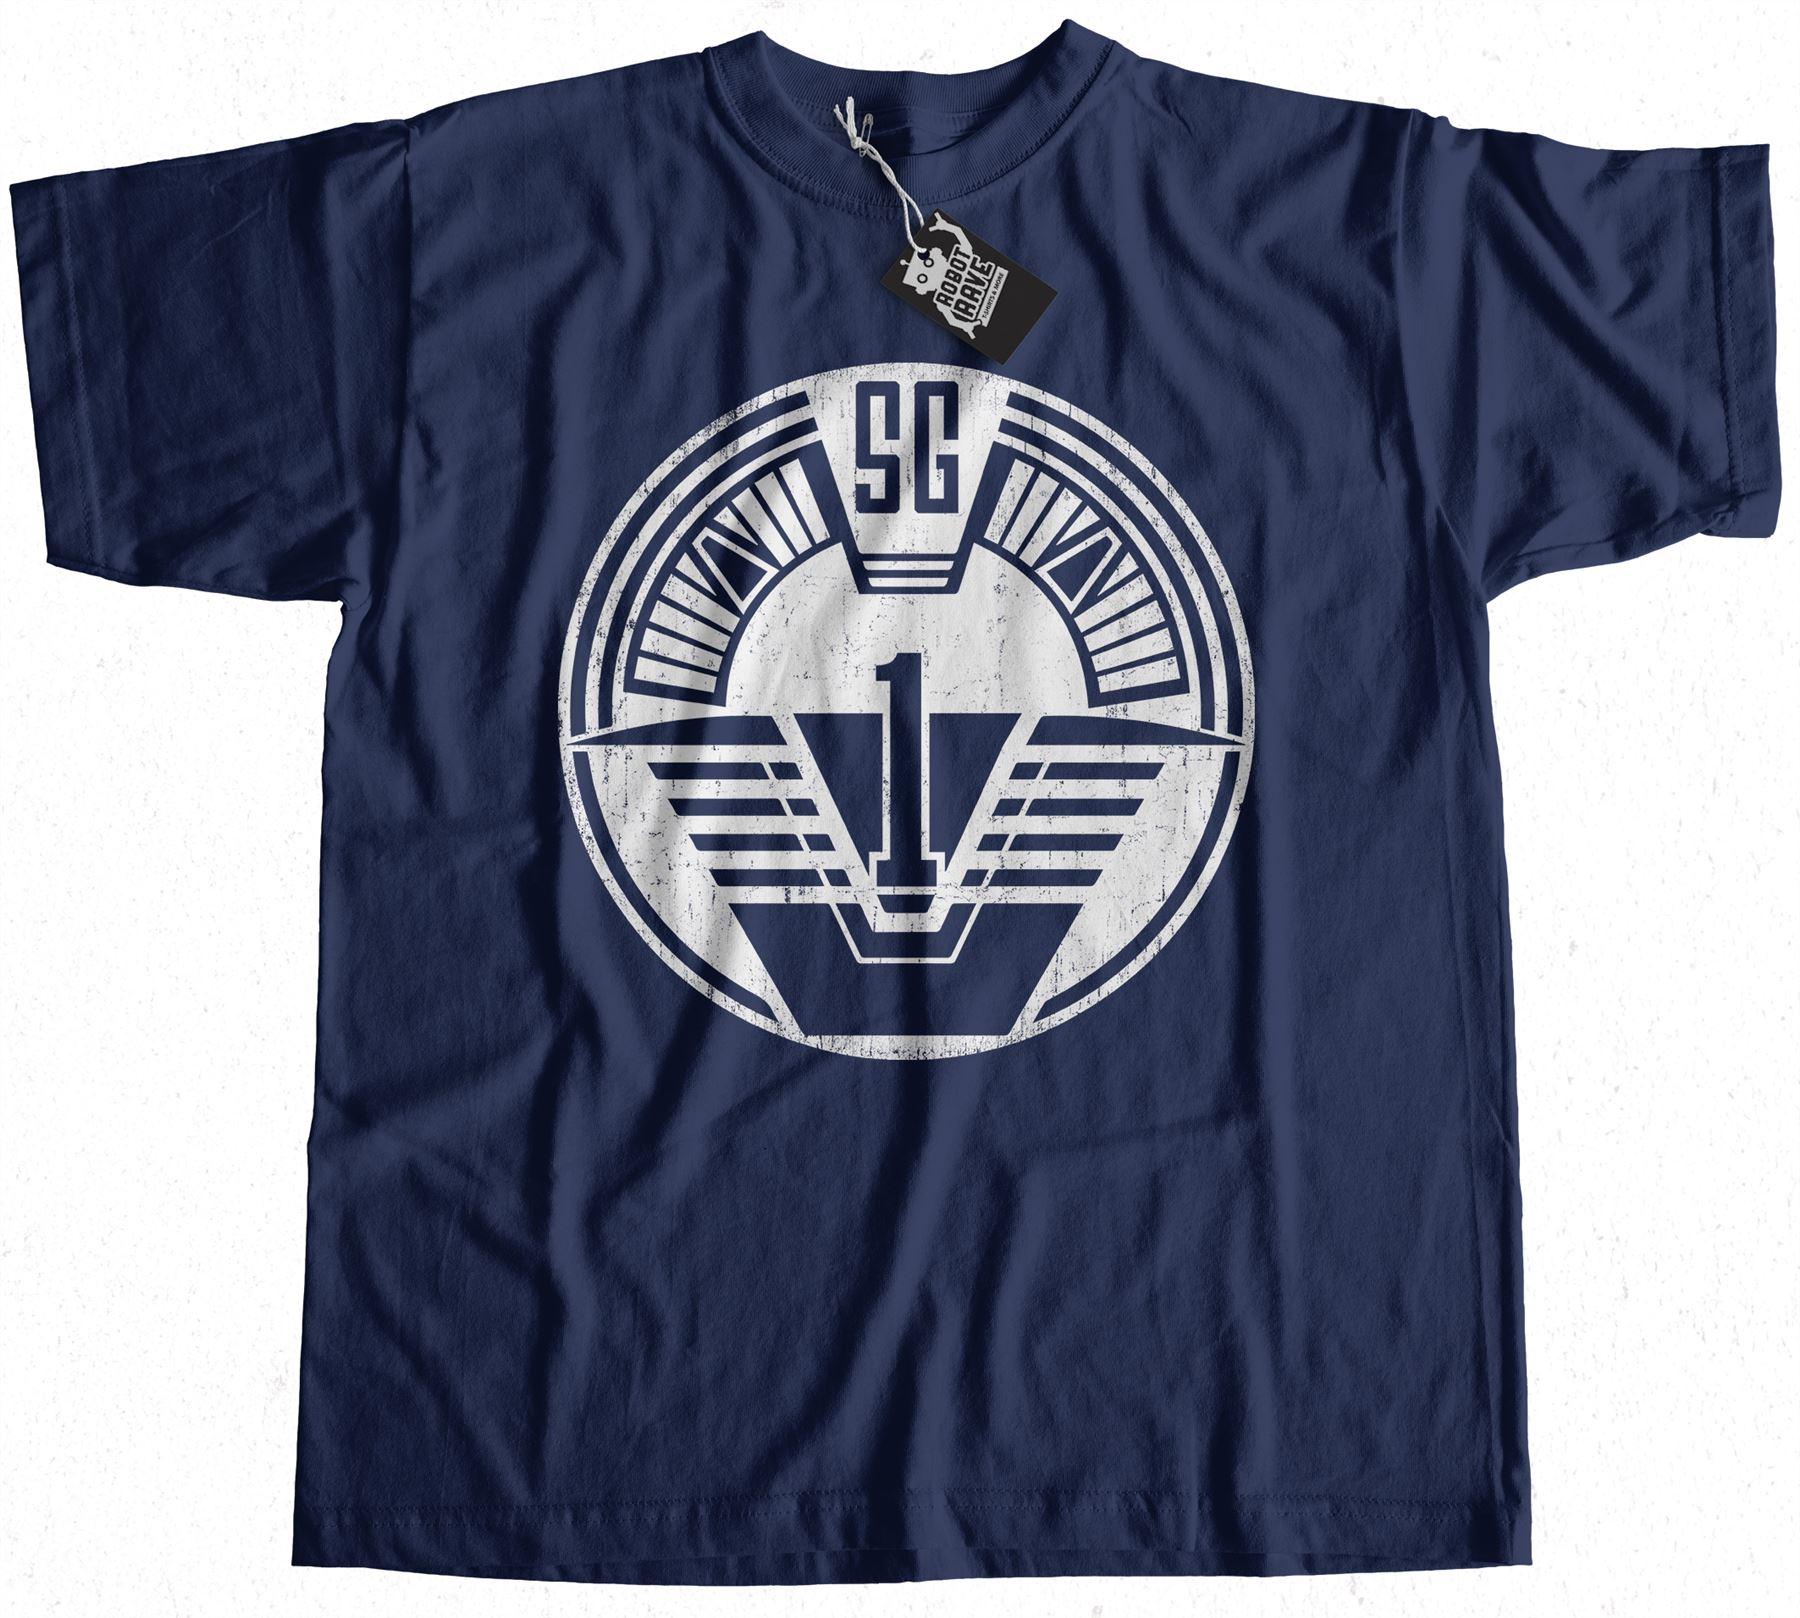 SG1-T-Shirt-100-Premium-Cotton Indexbild 18